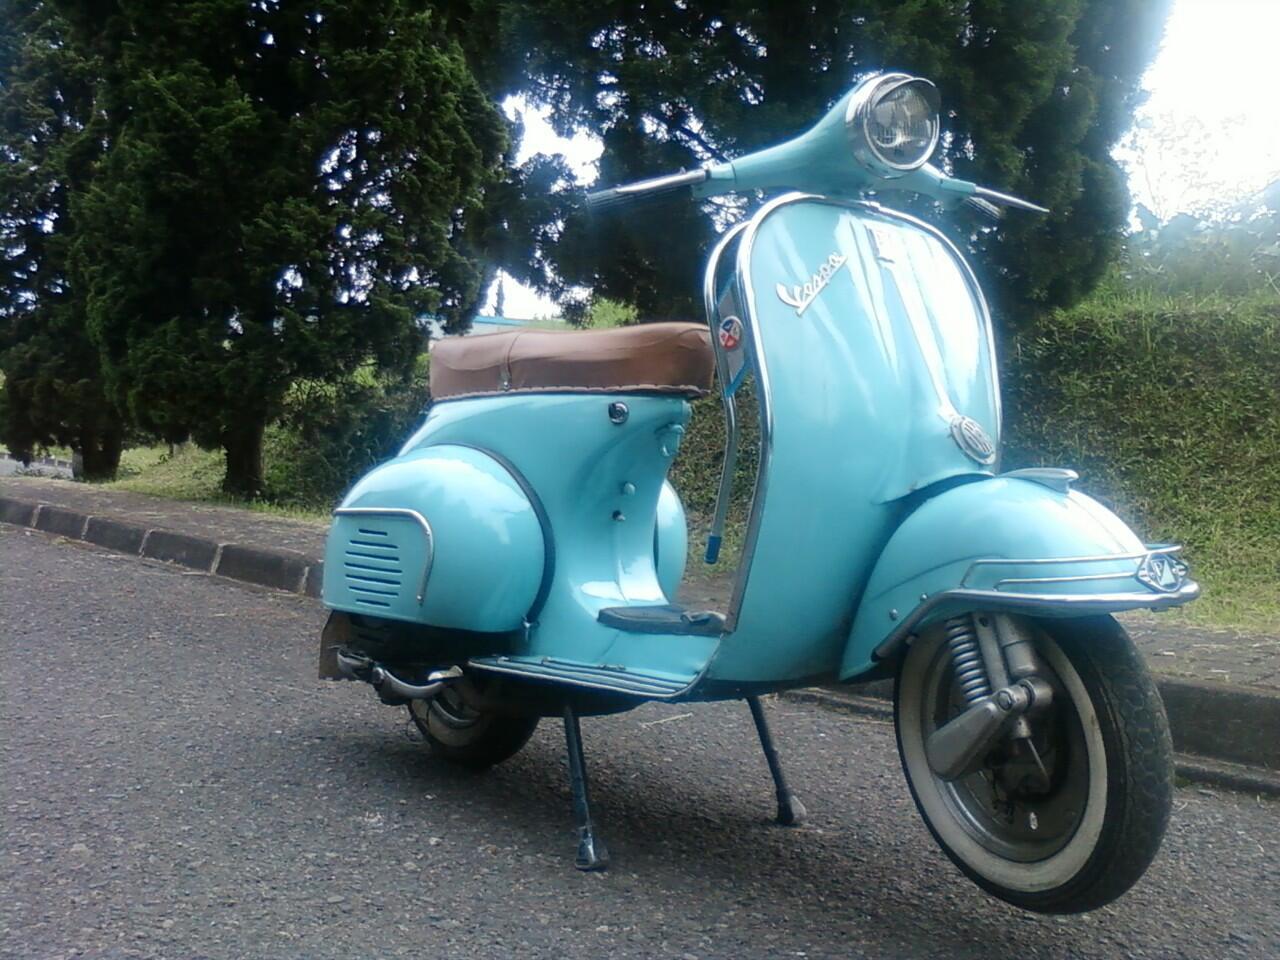 Turun Harga Vespa   Ganteng Original Look Classic